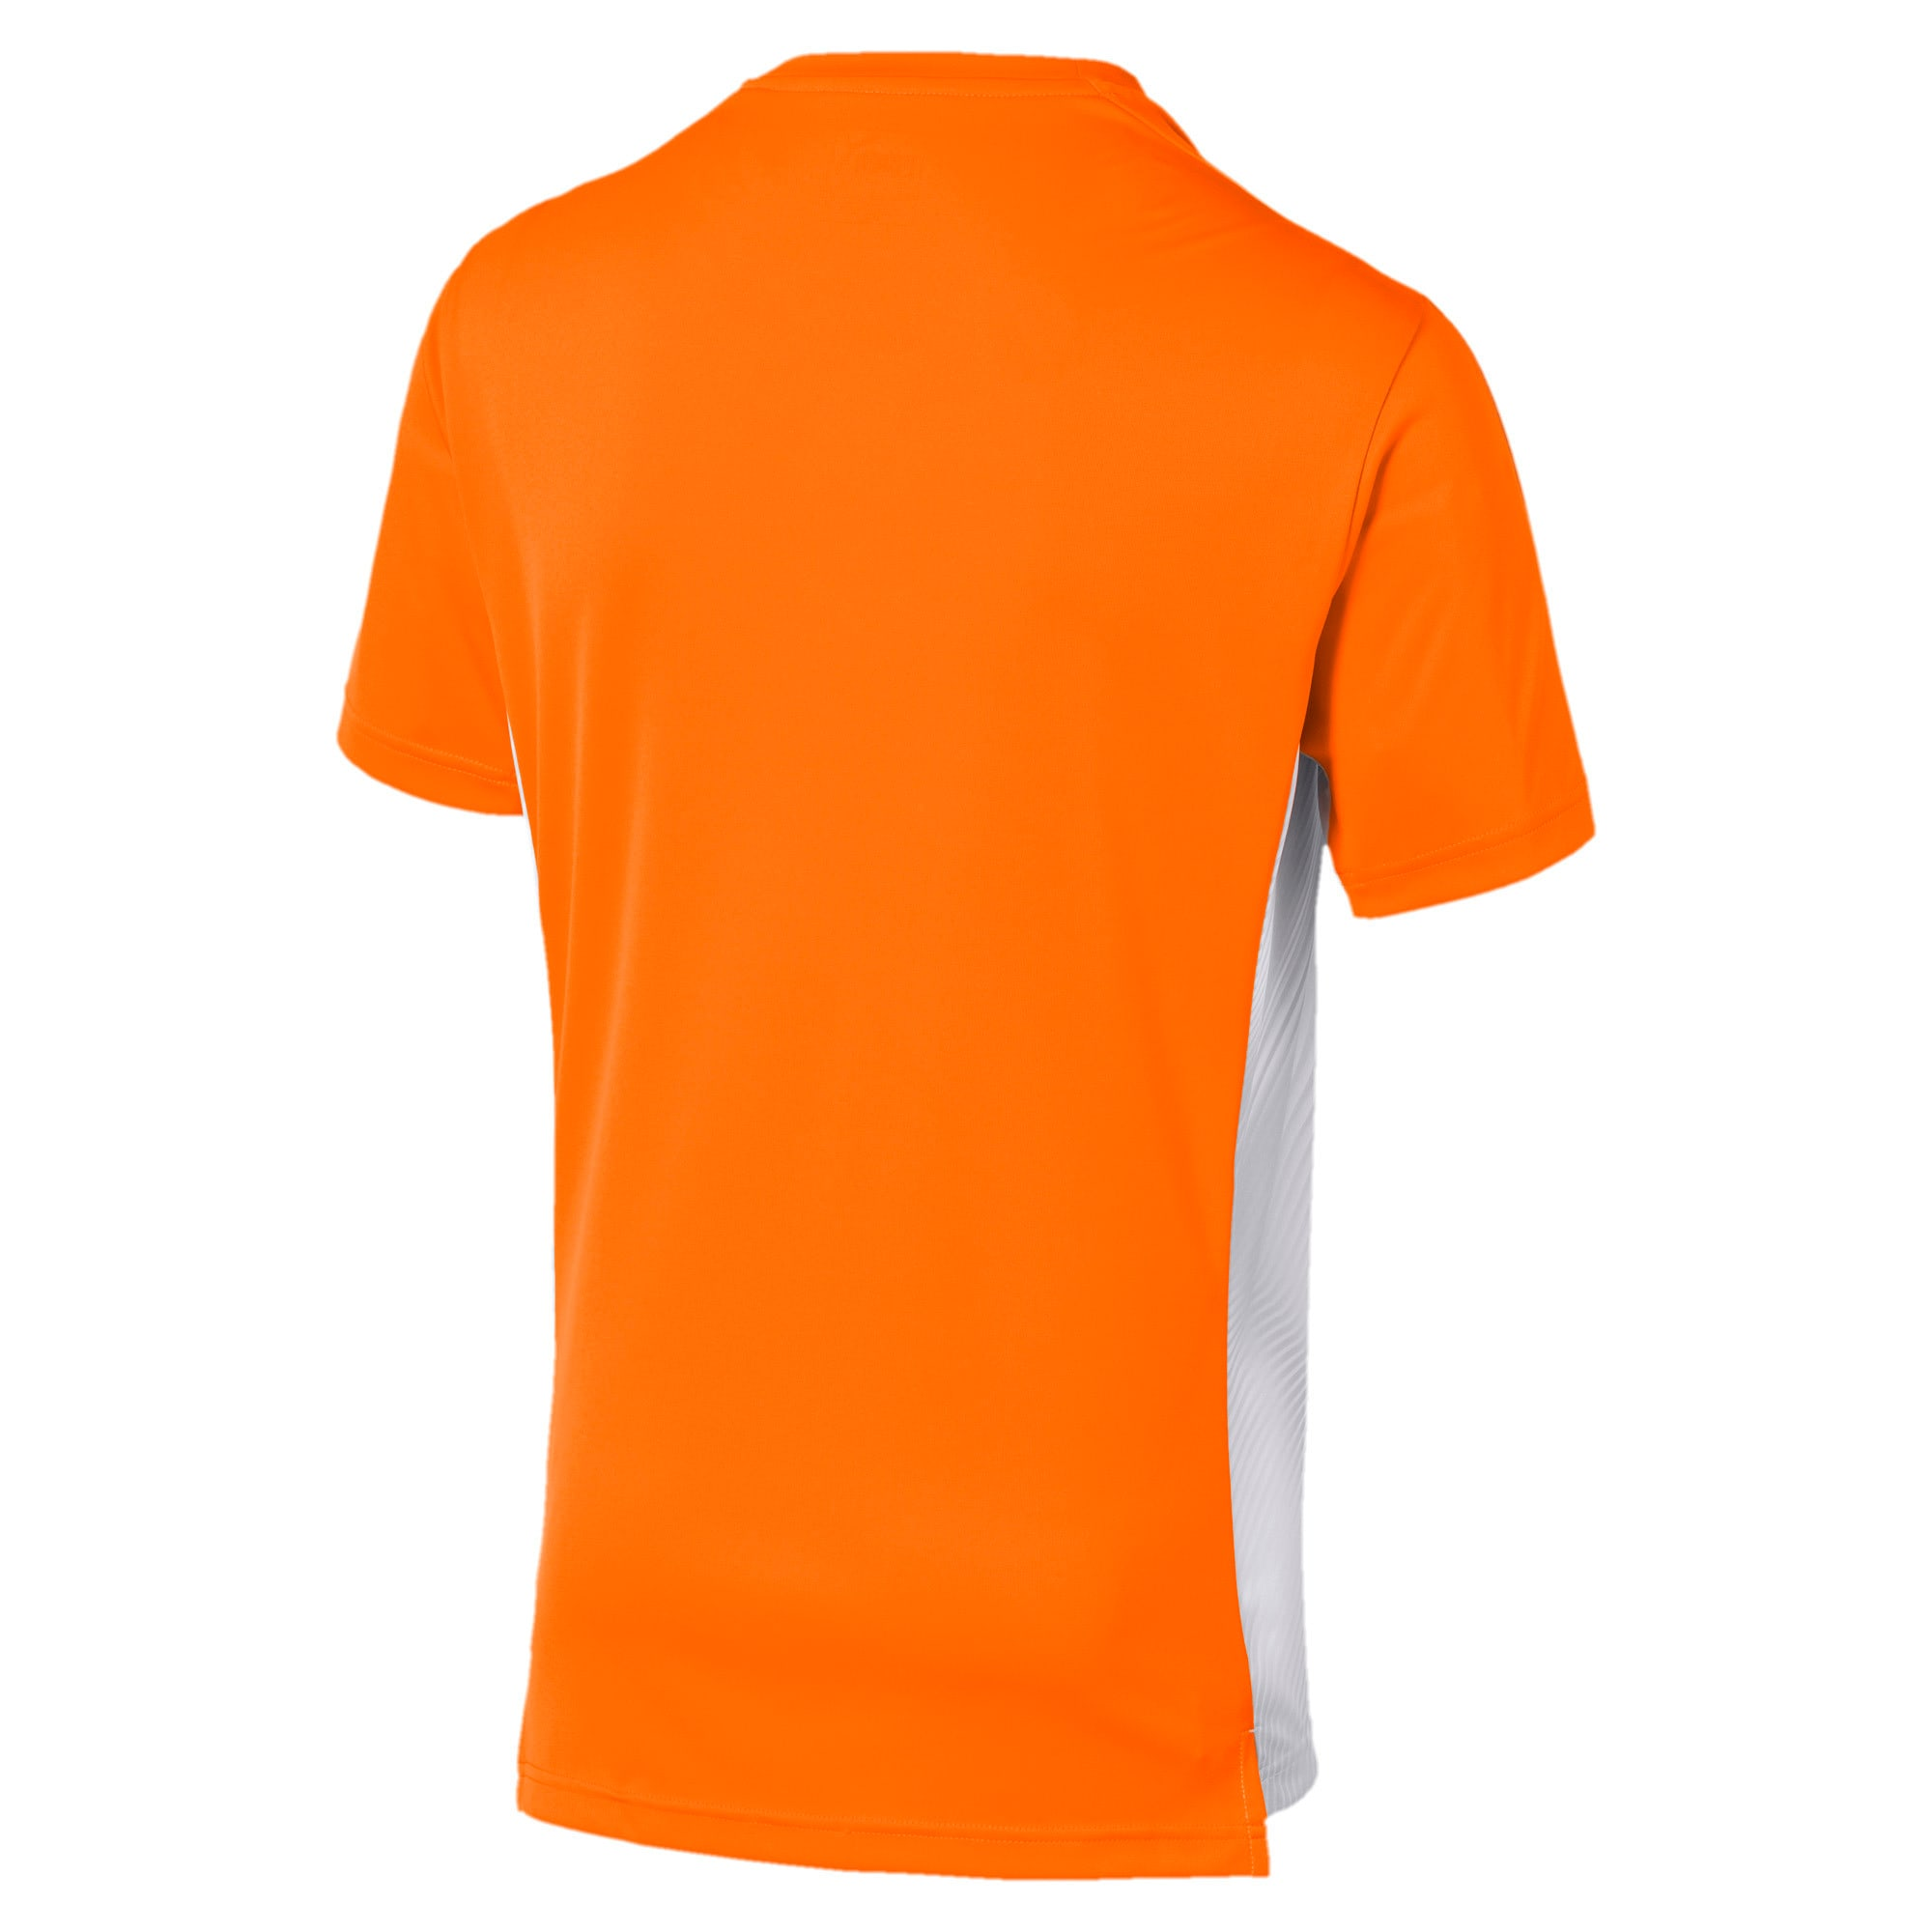 Thumbnail 2 of Valencia CF Men's Stadium Jersey, Vibrant Orange-Puma White, medium